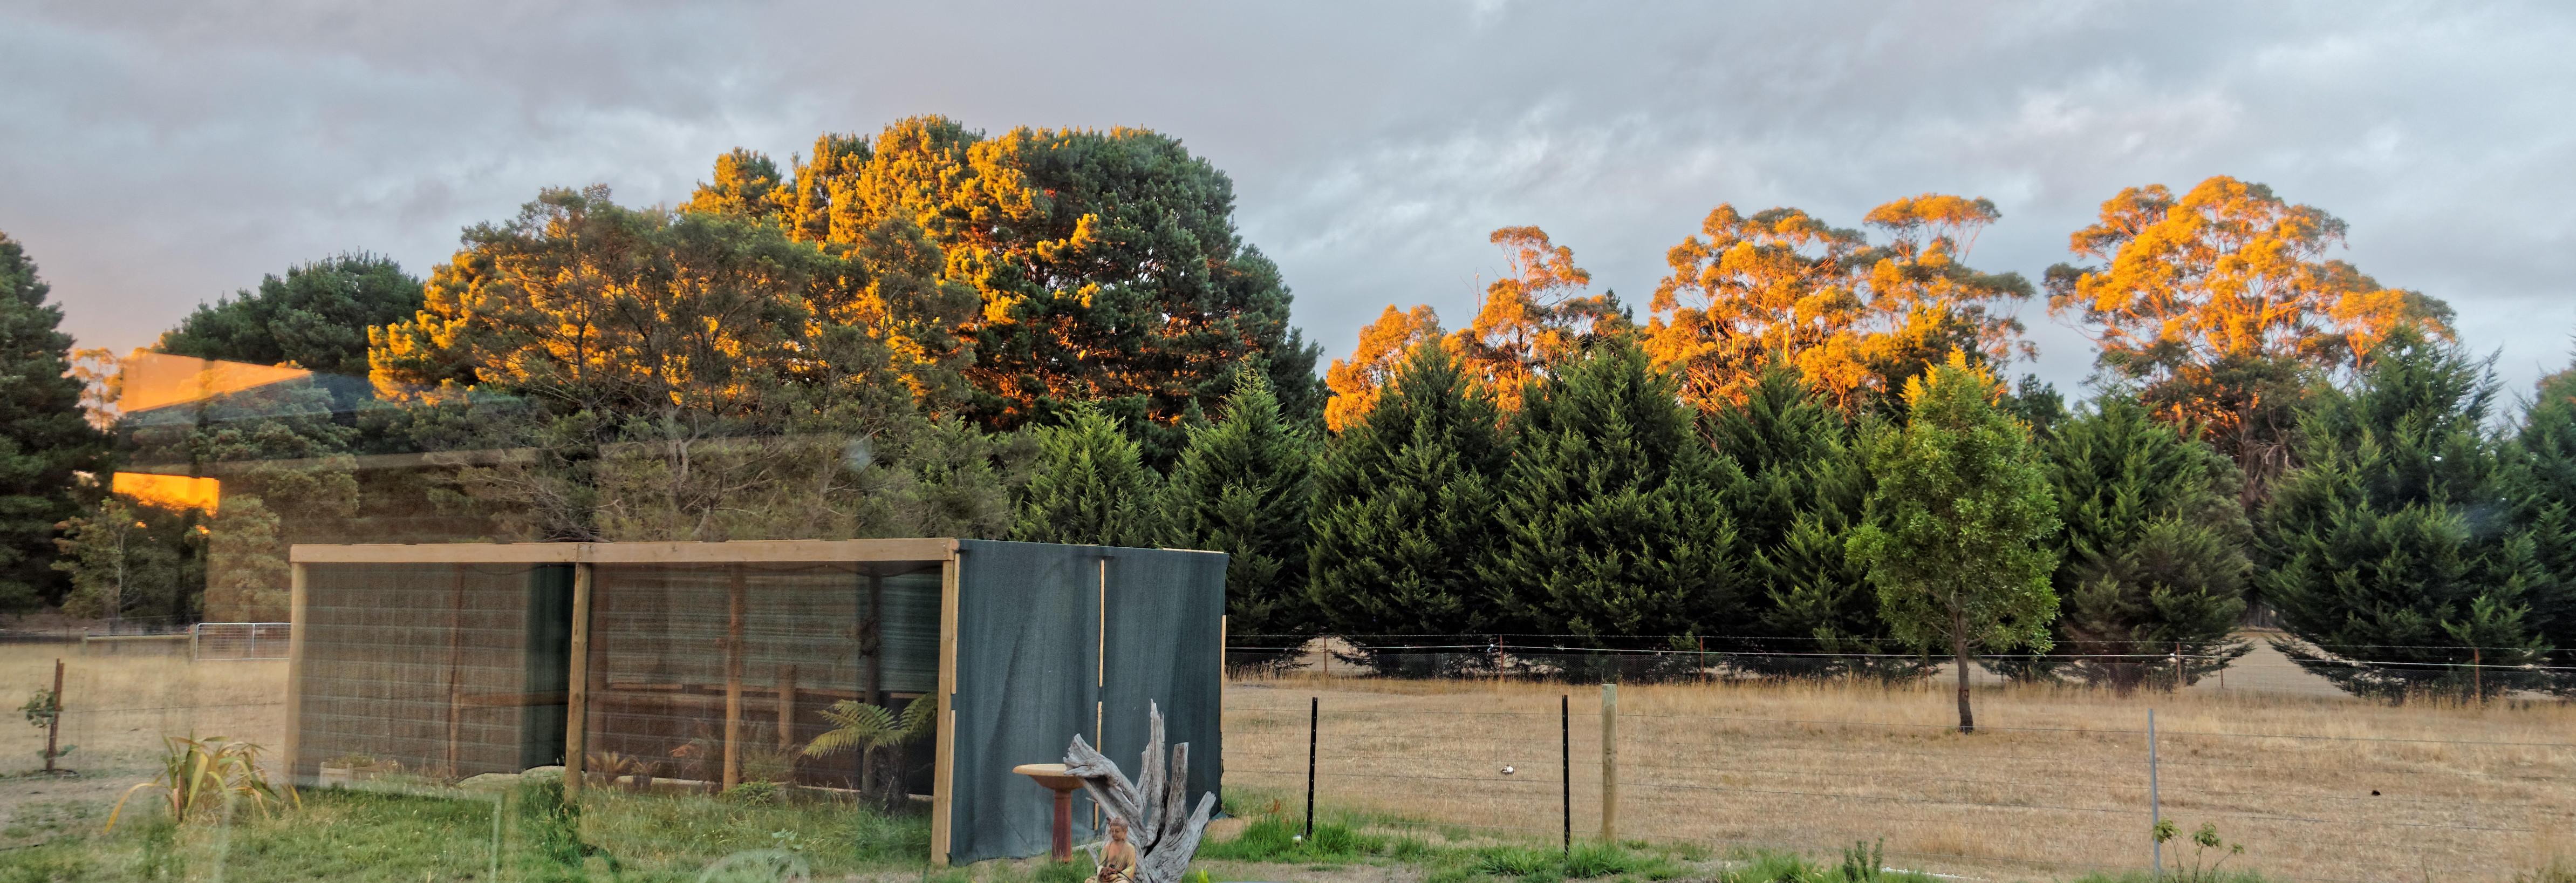 Sunset-2.jpeg